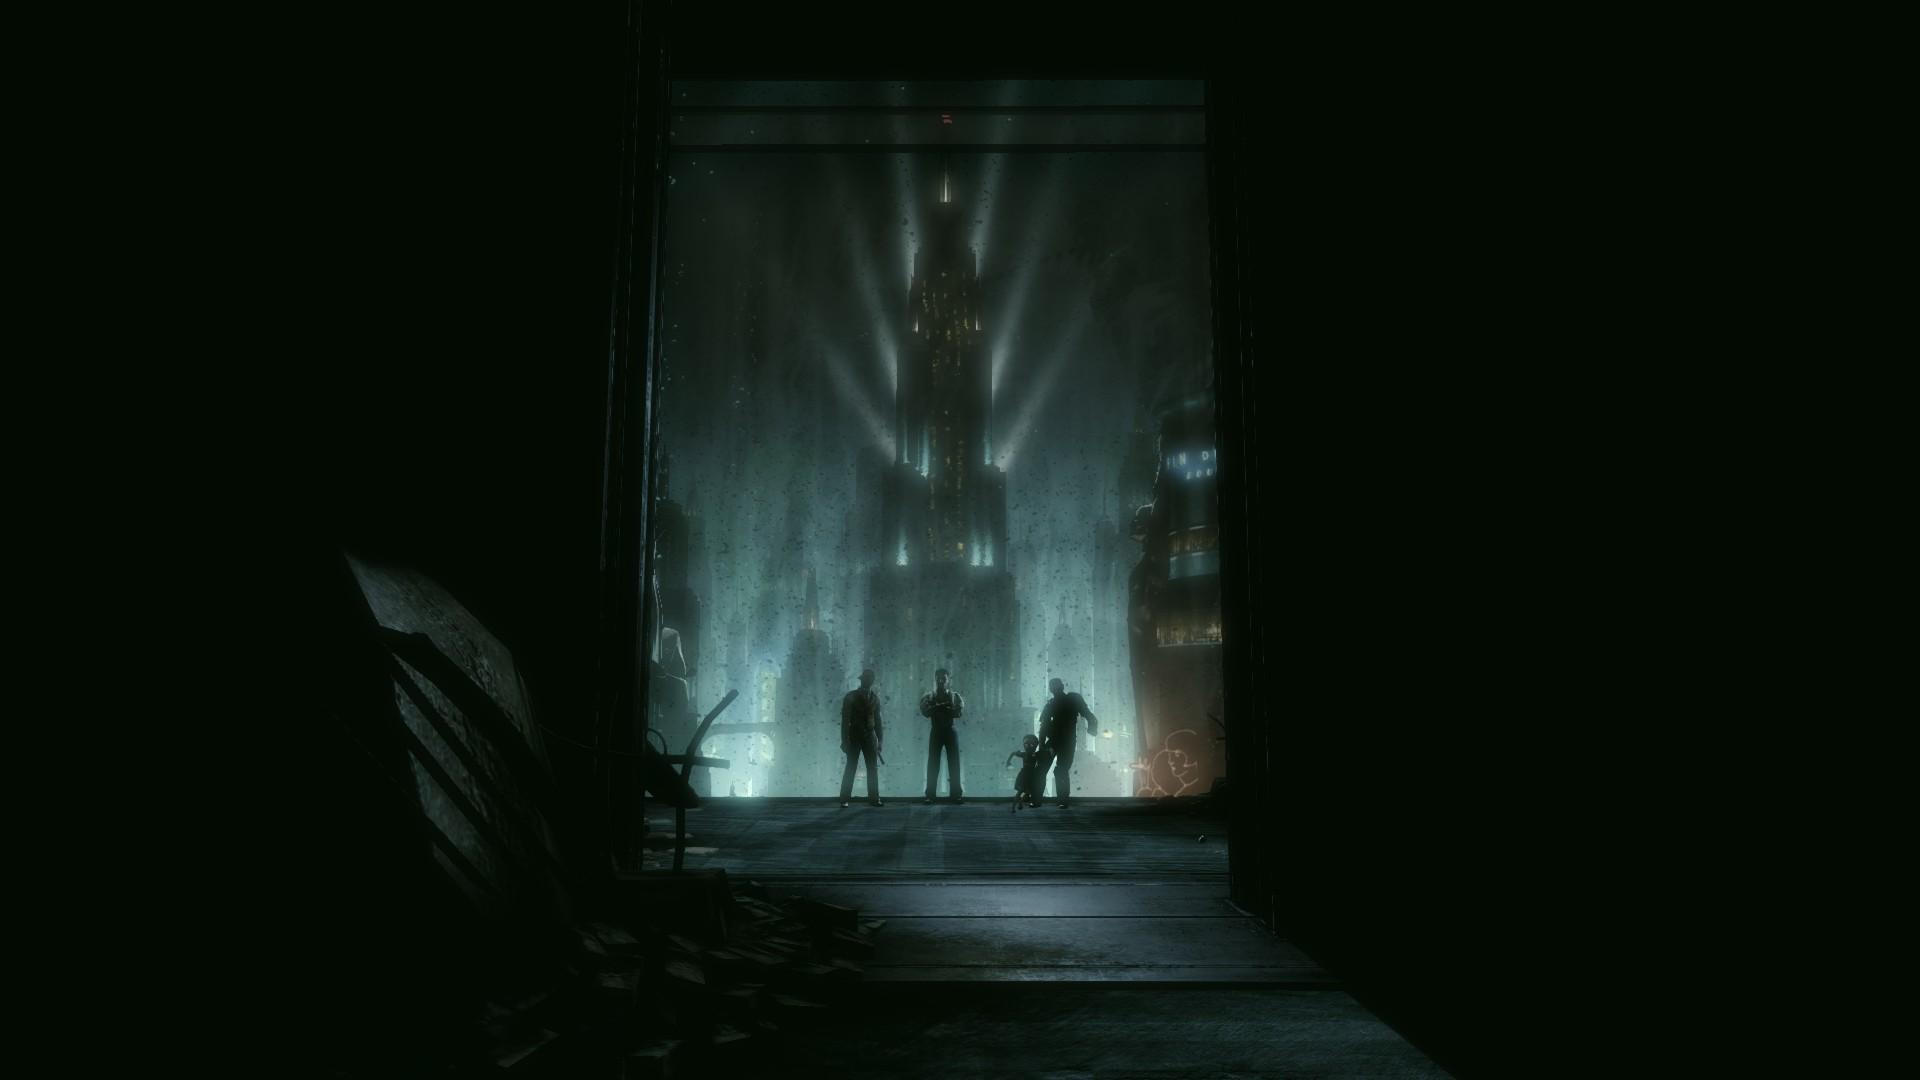 Wallpaper Anime Biohazard Infinite Darkness